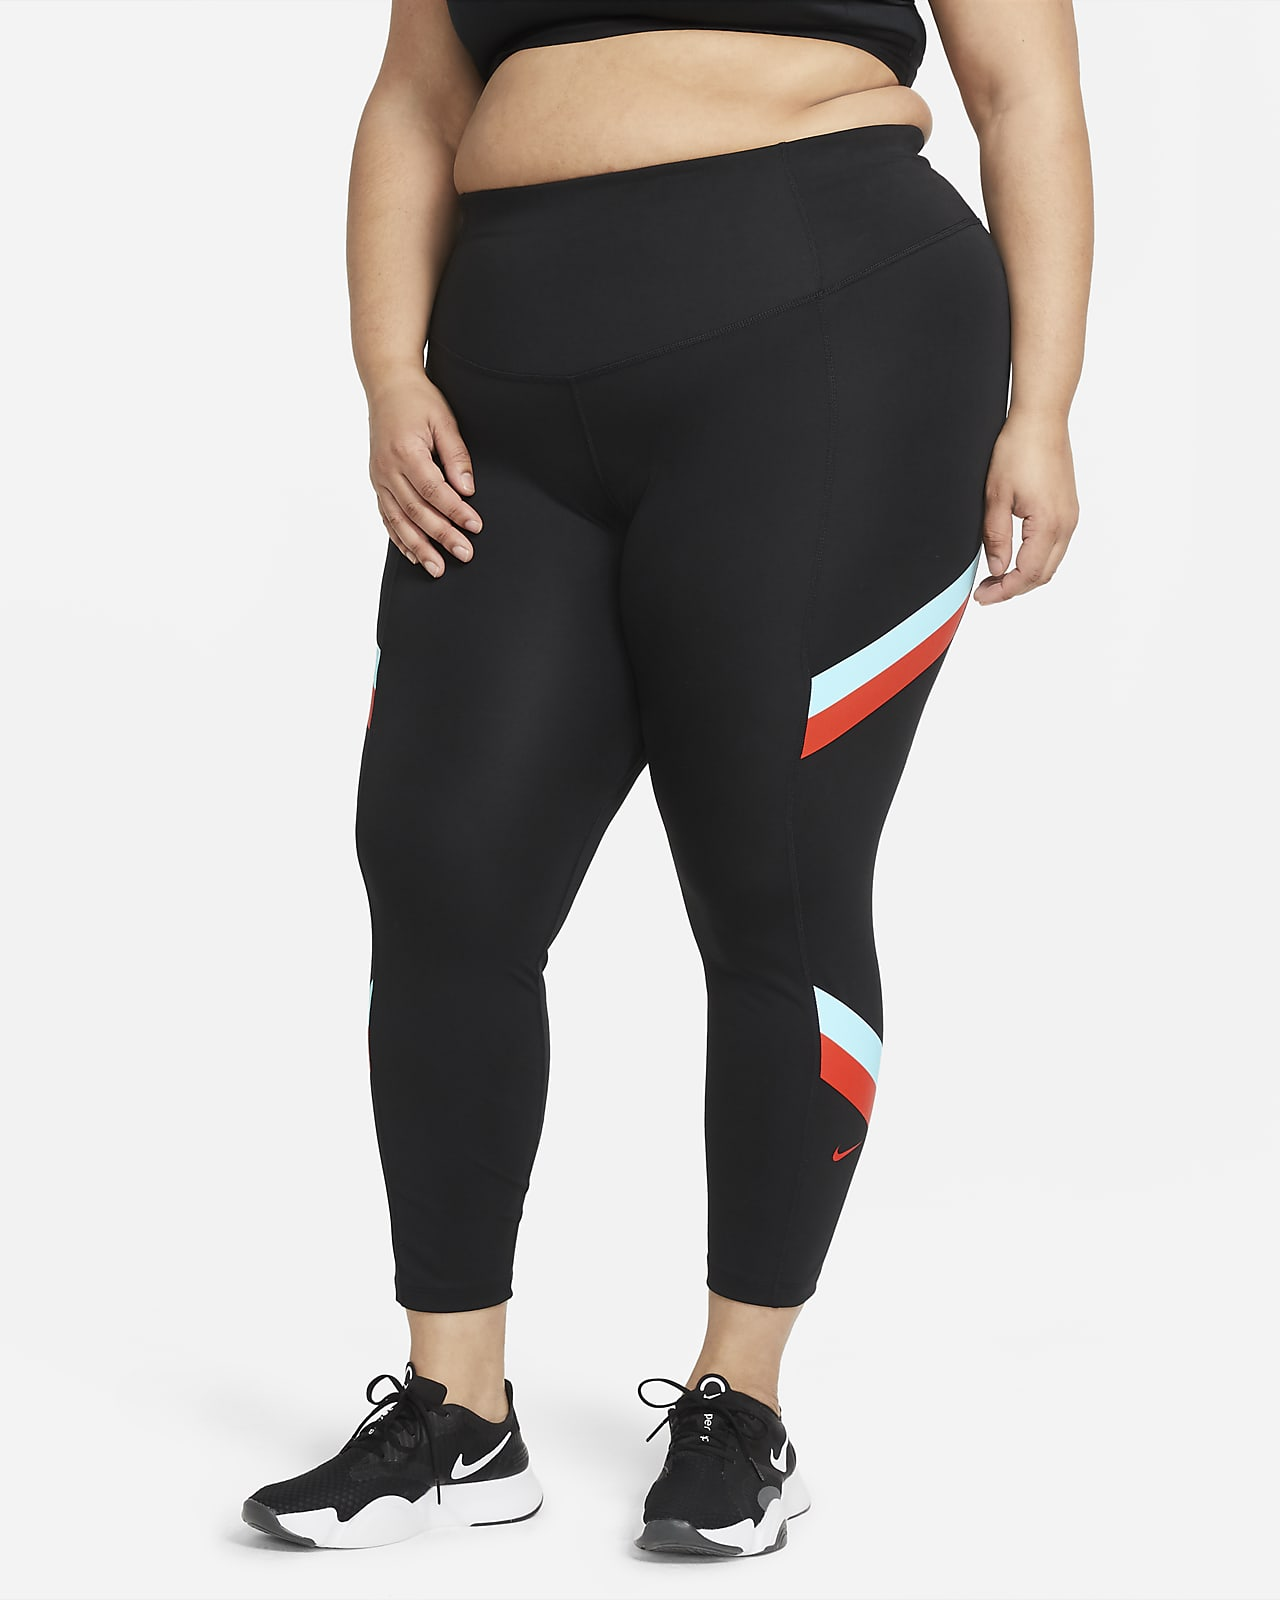 Nike One Women's Mid-Rise 7/8 Color-Blocked Stripe Leggings (Plus Size)